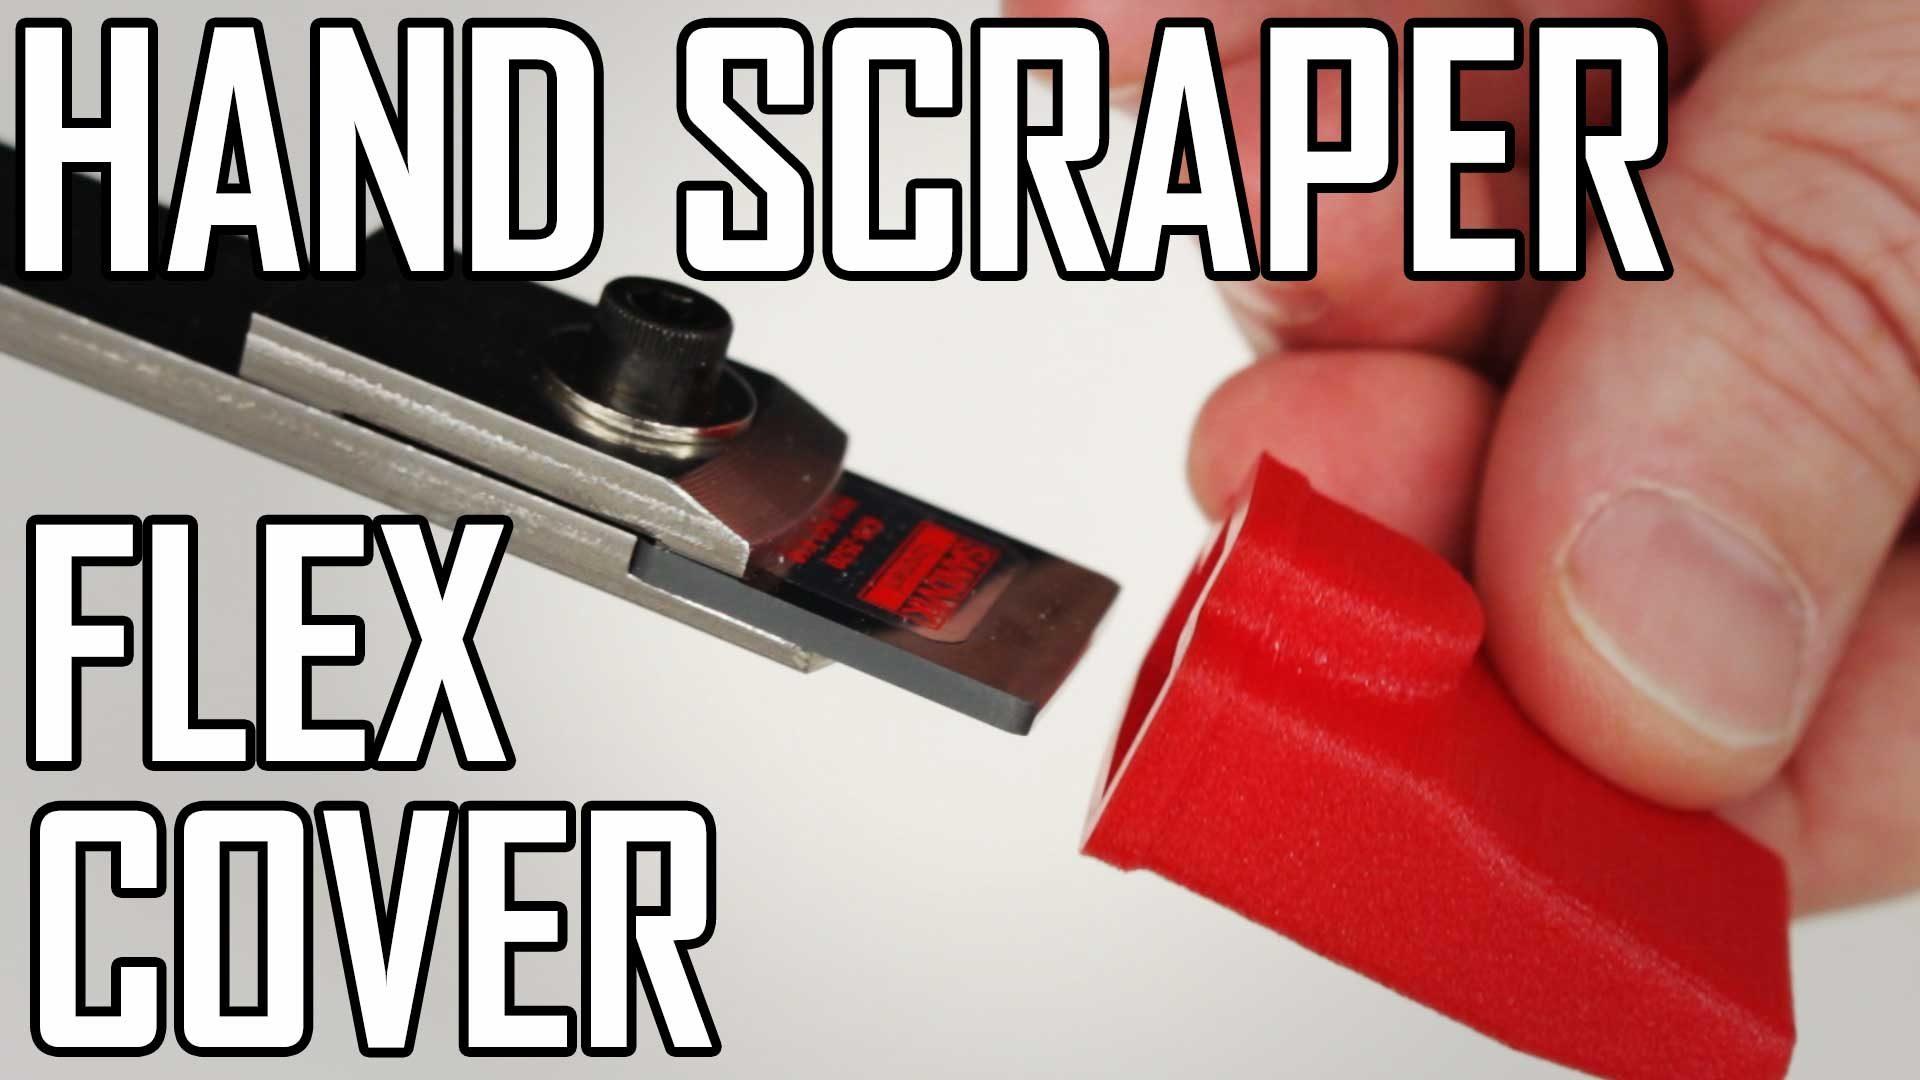 Hand Scraper 6: Making a Flexible Cover